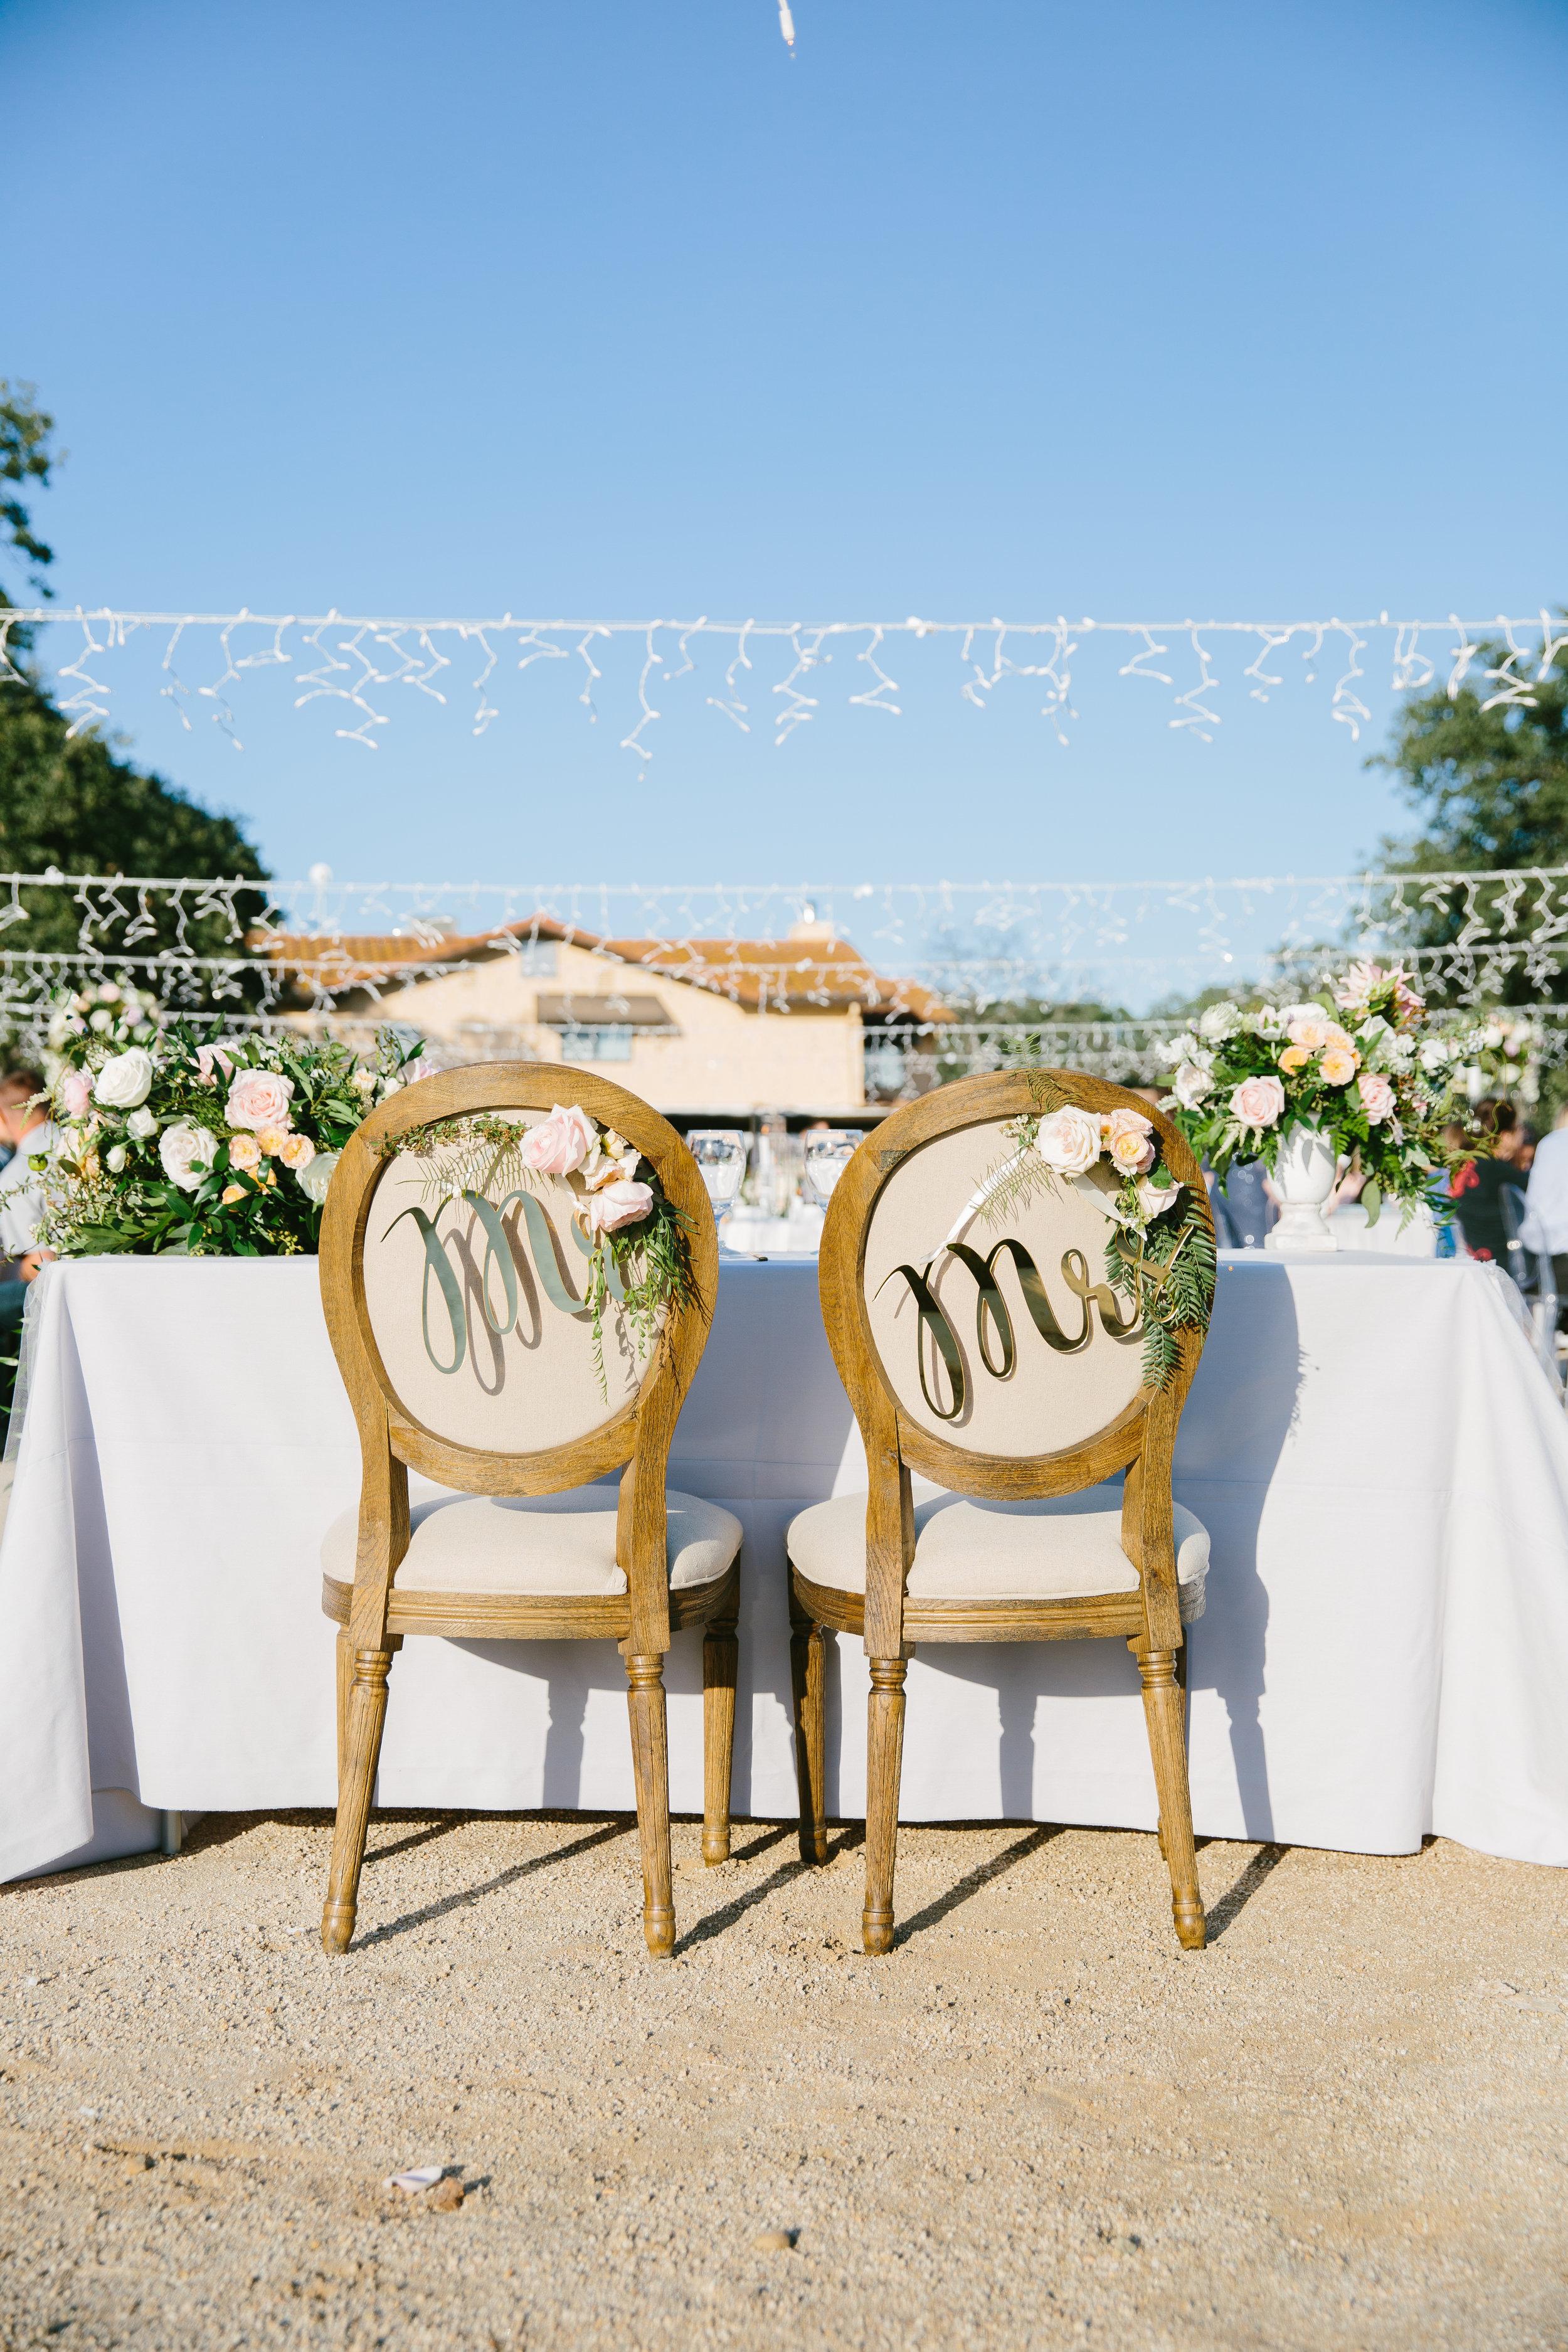 Violette-fleurs-event-design-roseville-anna-perevertaylo-rancho-robles-vinyards-Bliss-Flowers-Traditional-Luxury-Design-chari.jpg